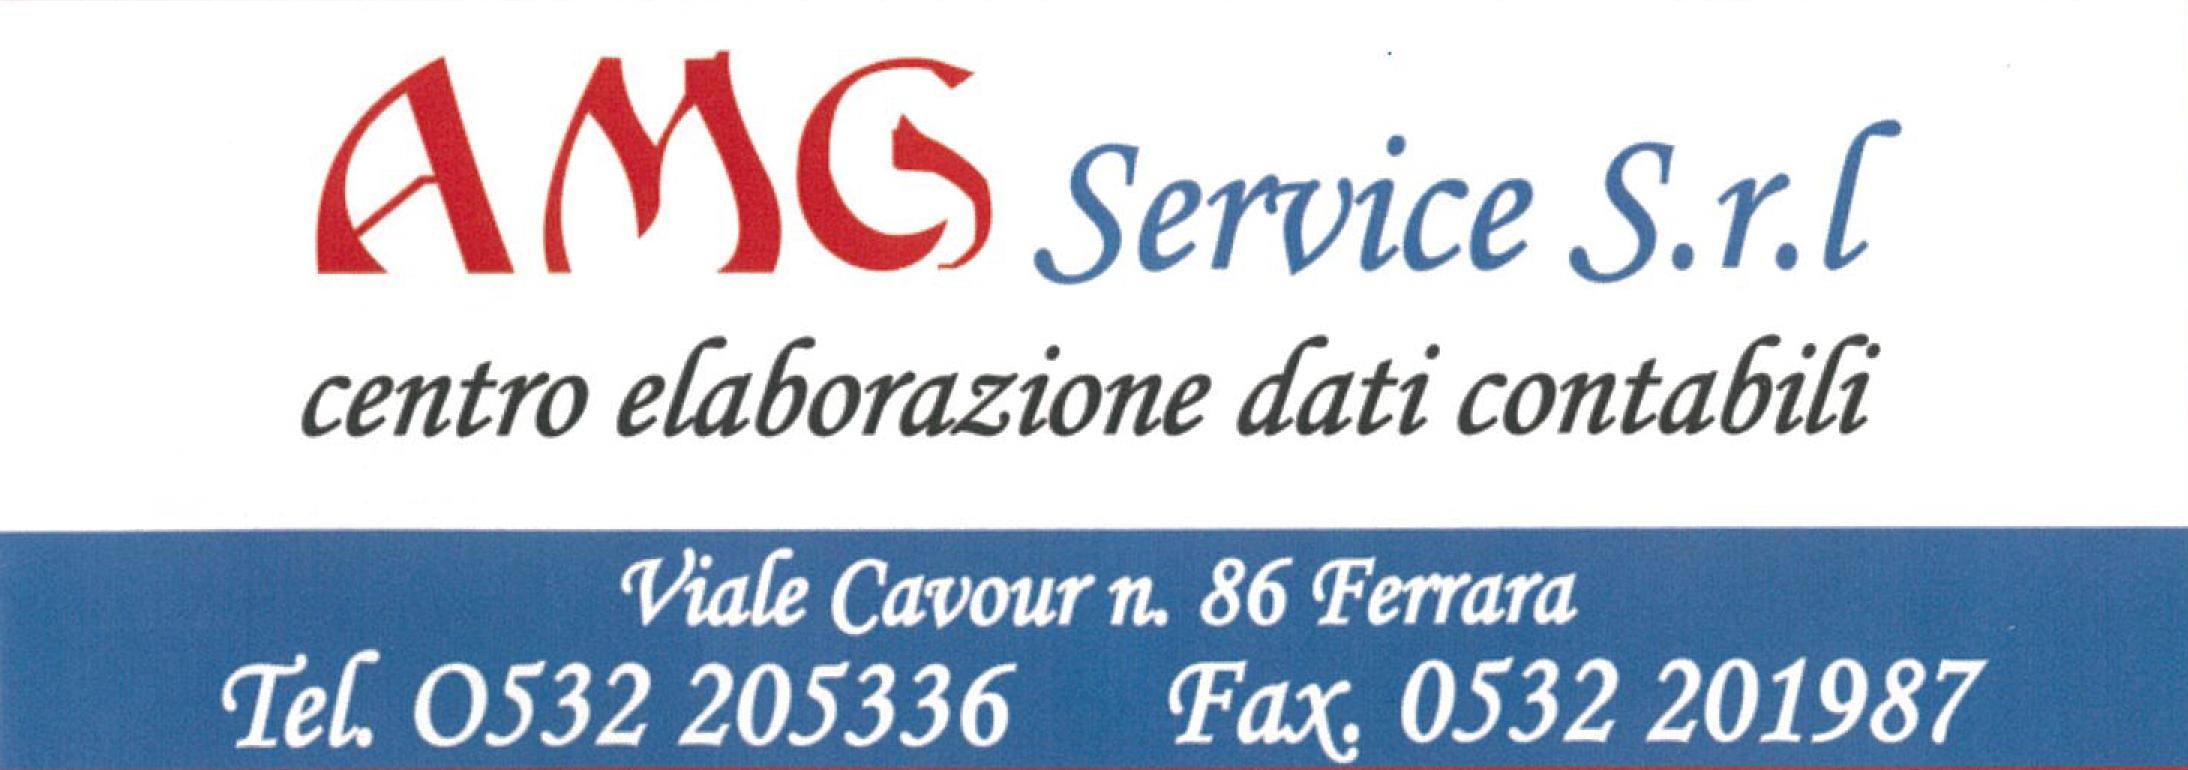 AMG Service srl.